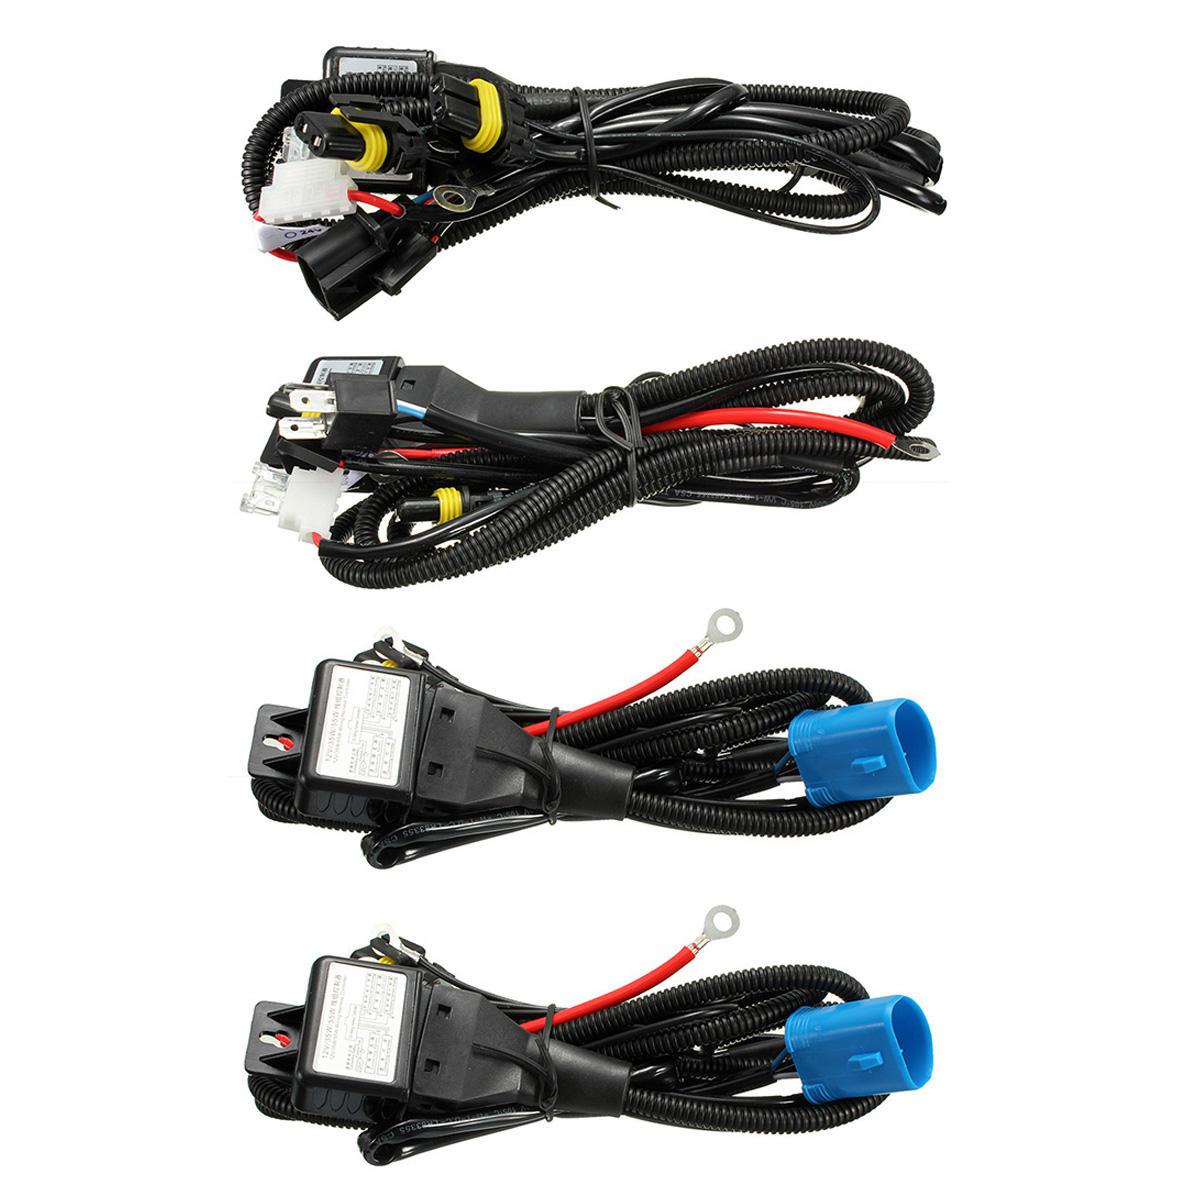 H4 9003 9004 9007 H13 9008 Hid Bi Xenon Bulb Relay Controller Wiring Harness Sale